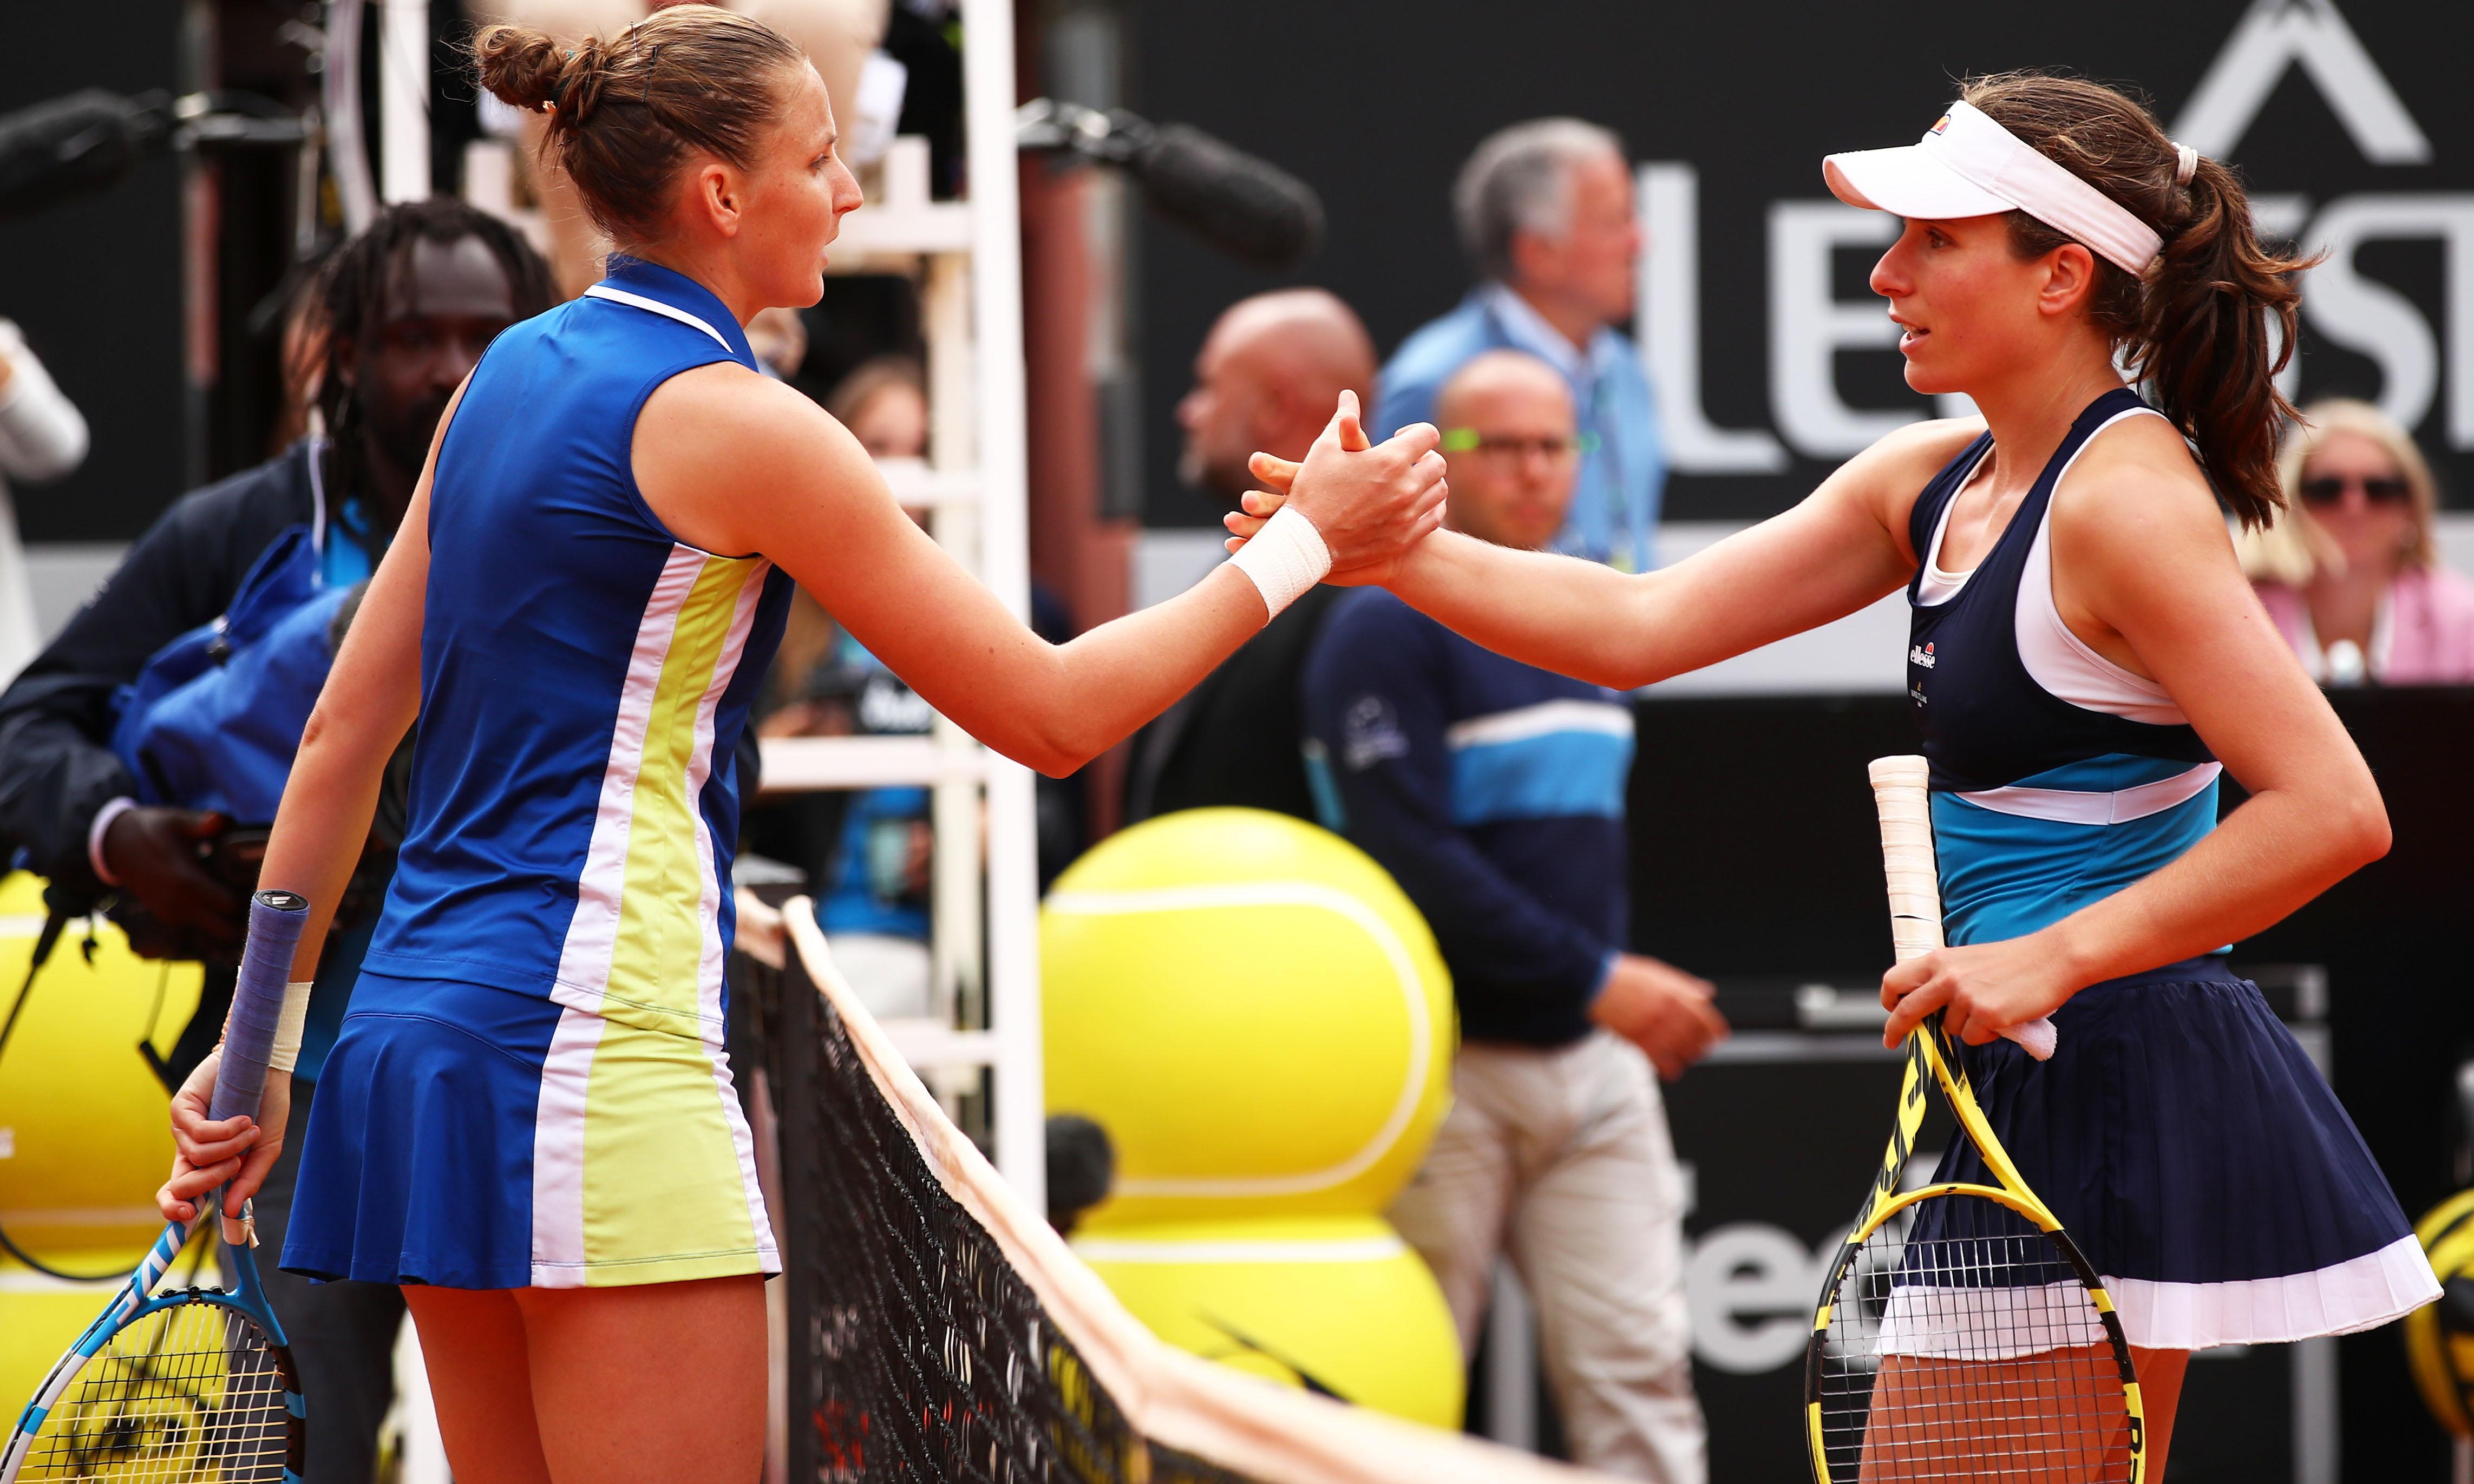 Johanna Konta loses Italian Open final to Karolina Pliskova in straight sets